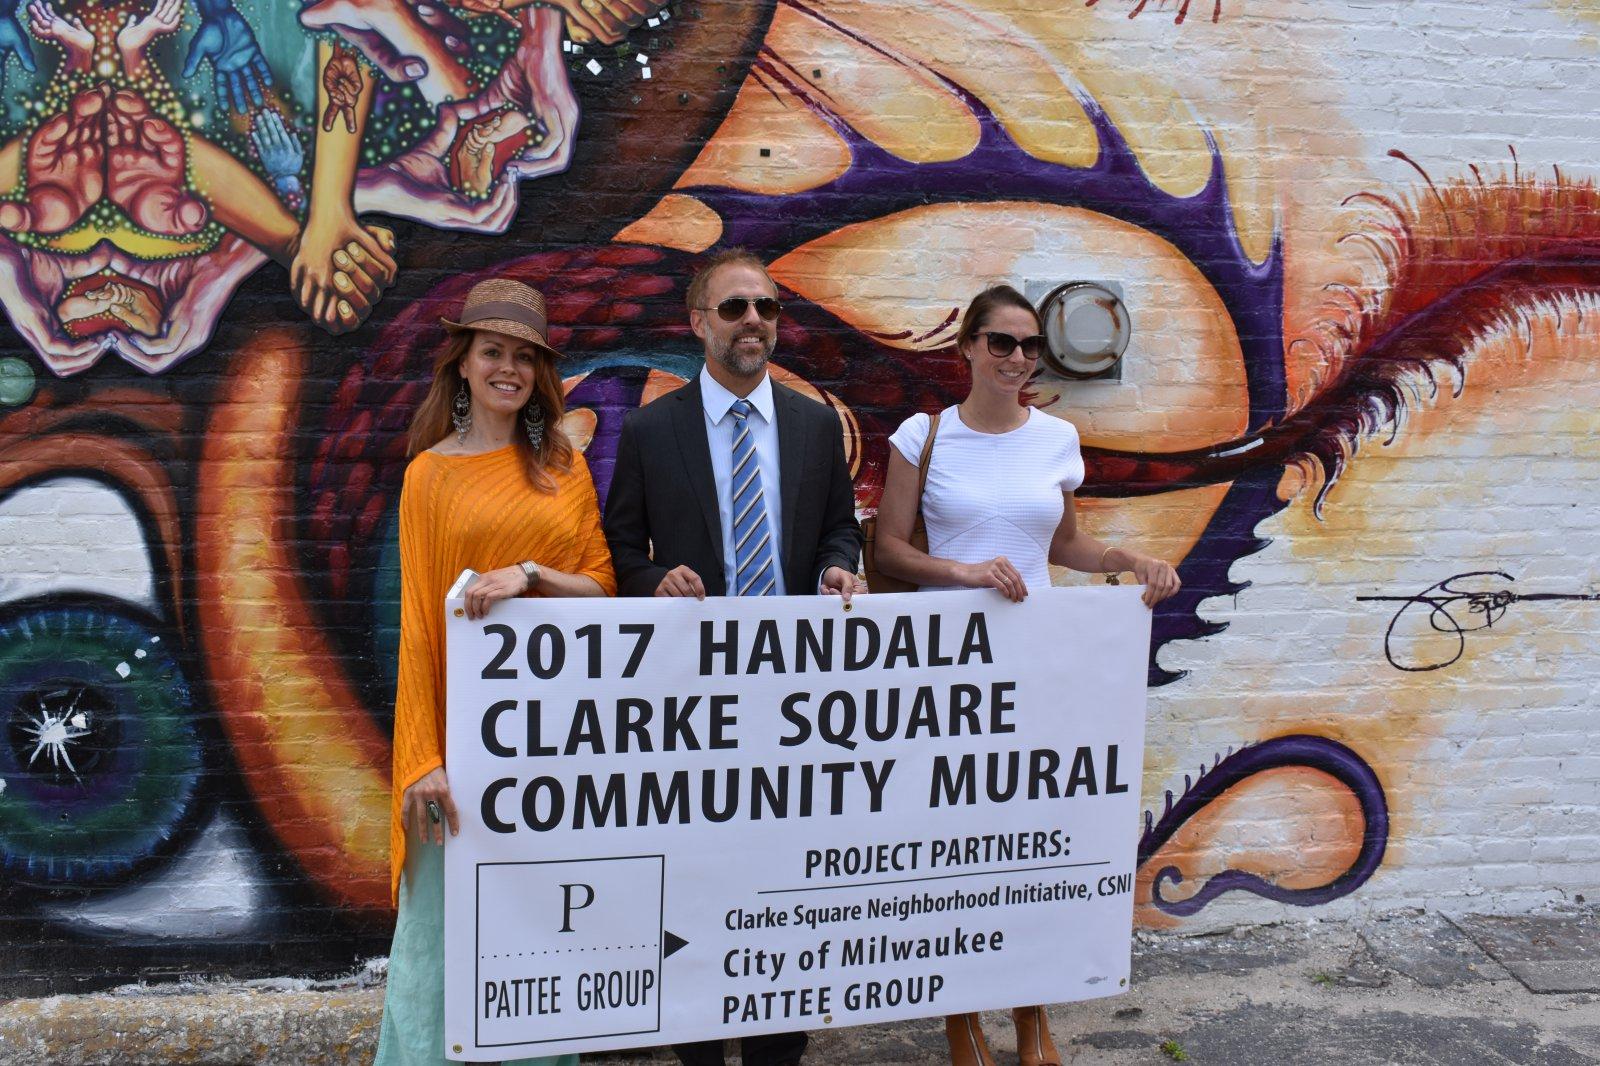 National Avenue Mural Celebrated